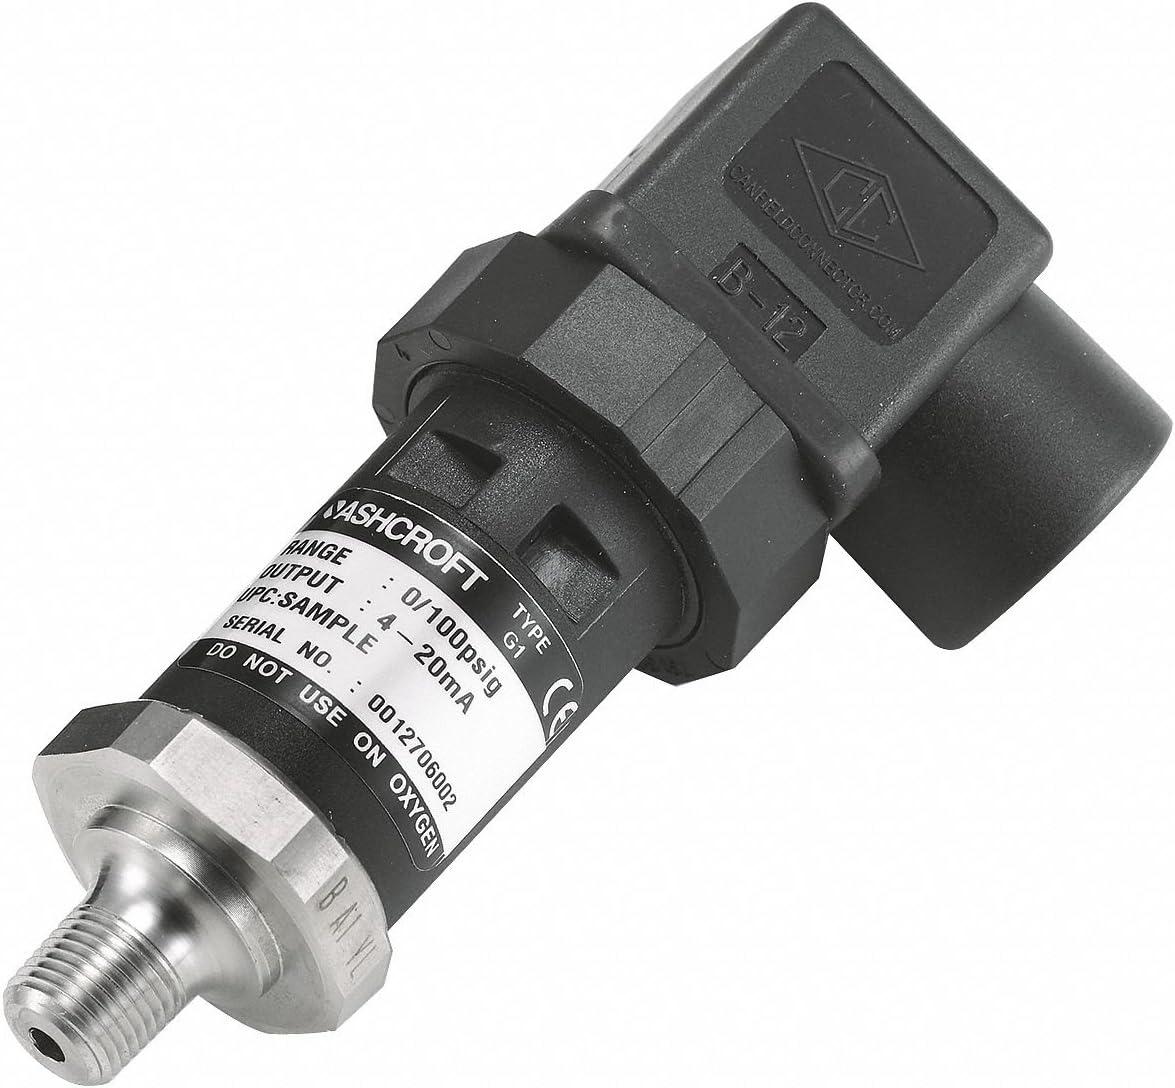 4 to 20mA DC Output 1//8 MNPT Pressure Transmitter 0 to 500 psi